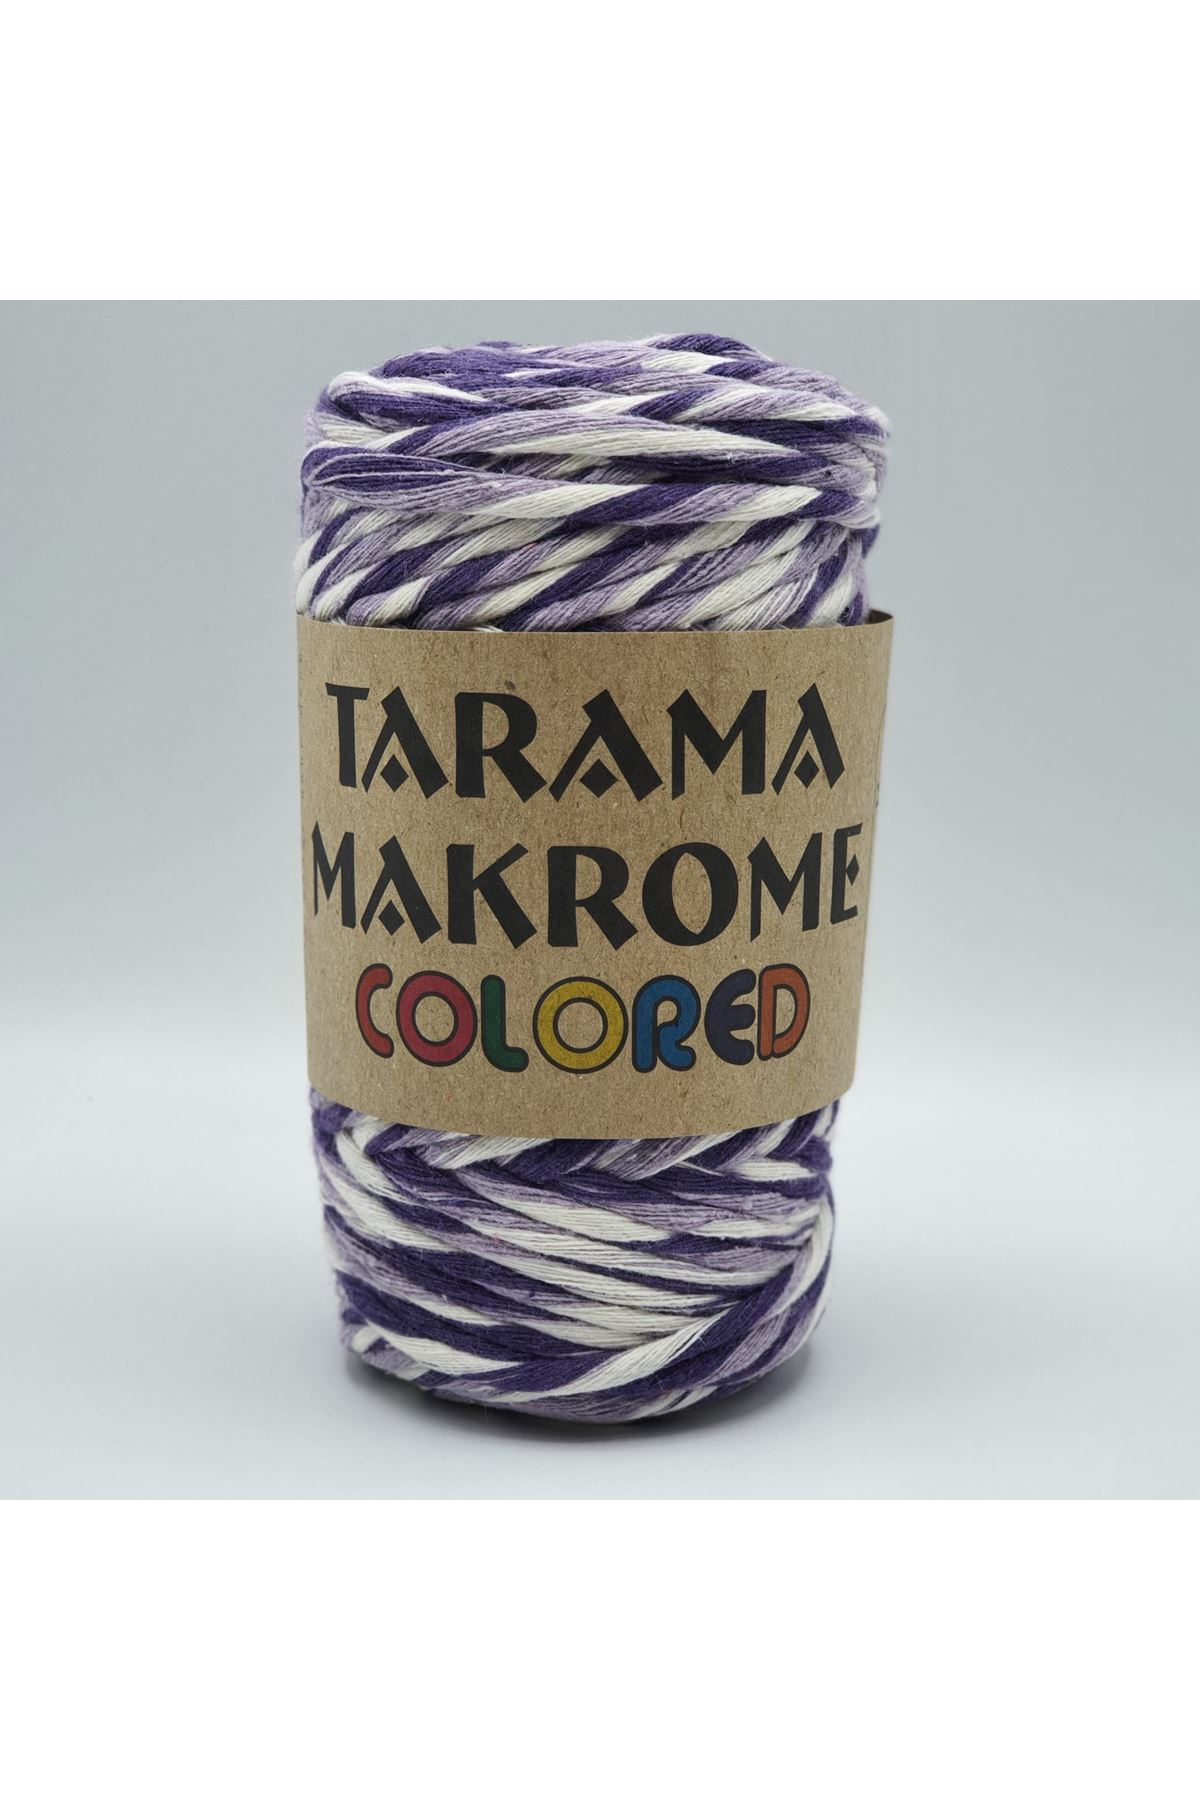 Tarama Makrome Colored 5 mm - 02